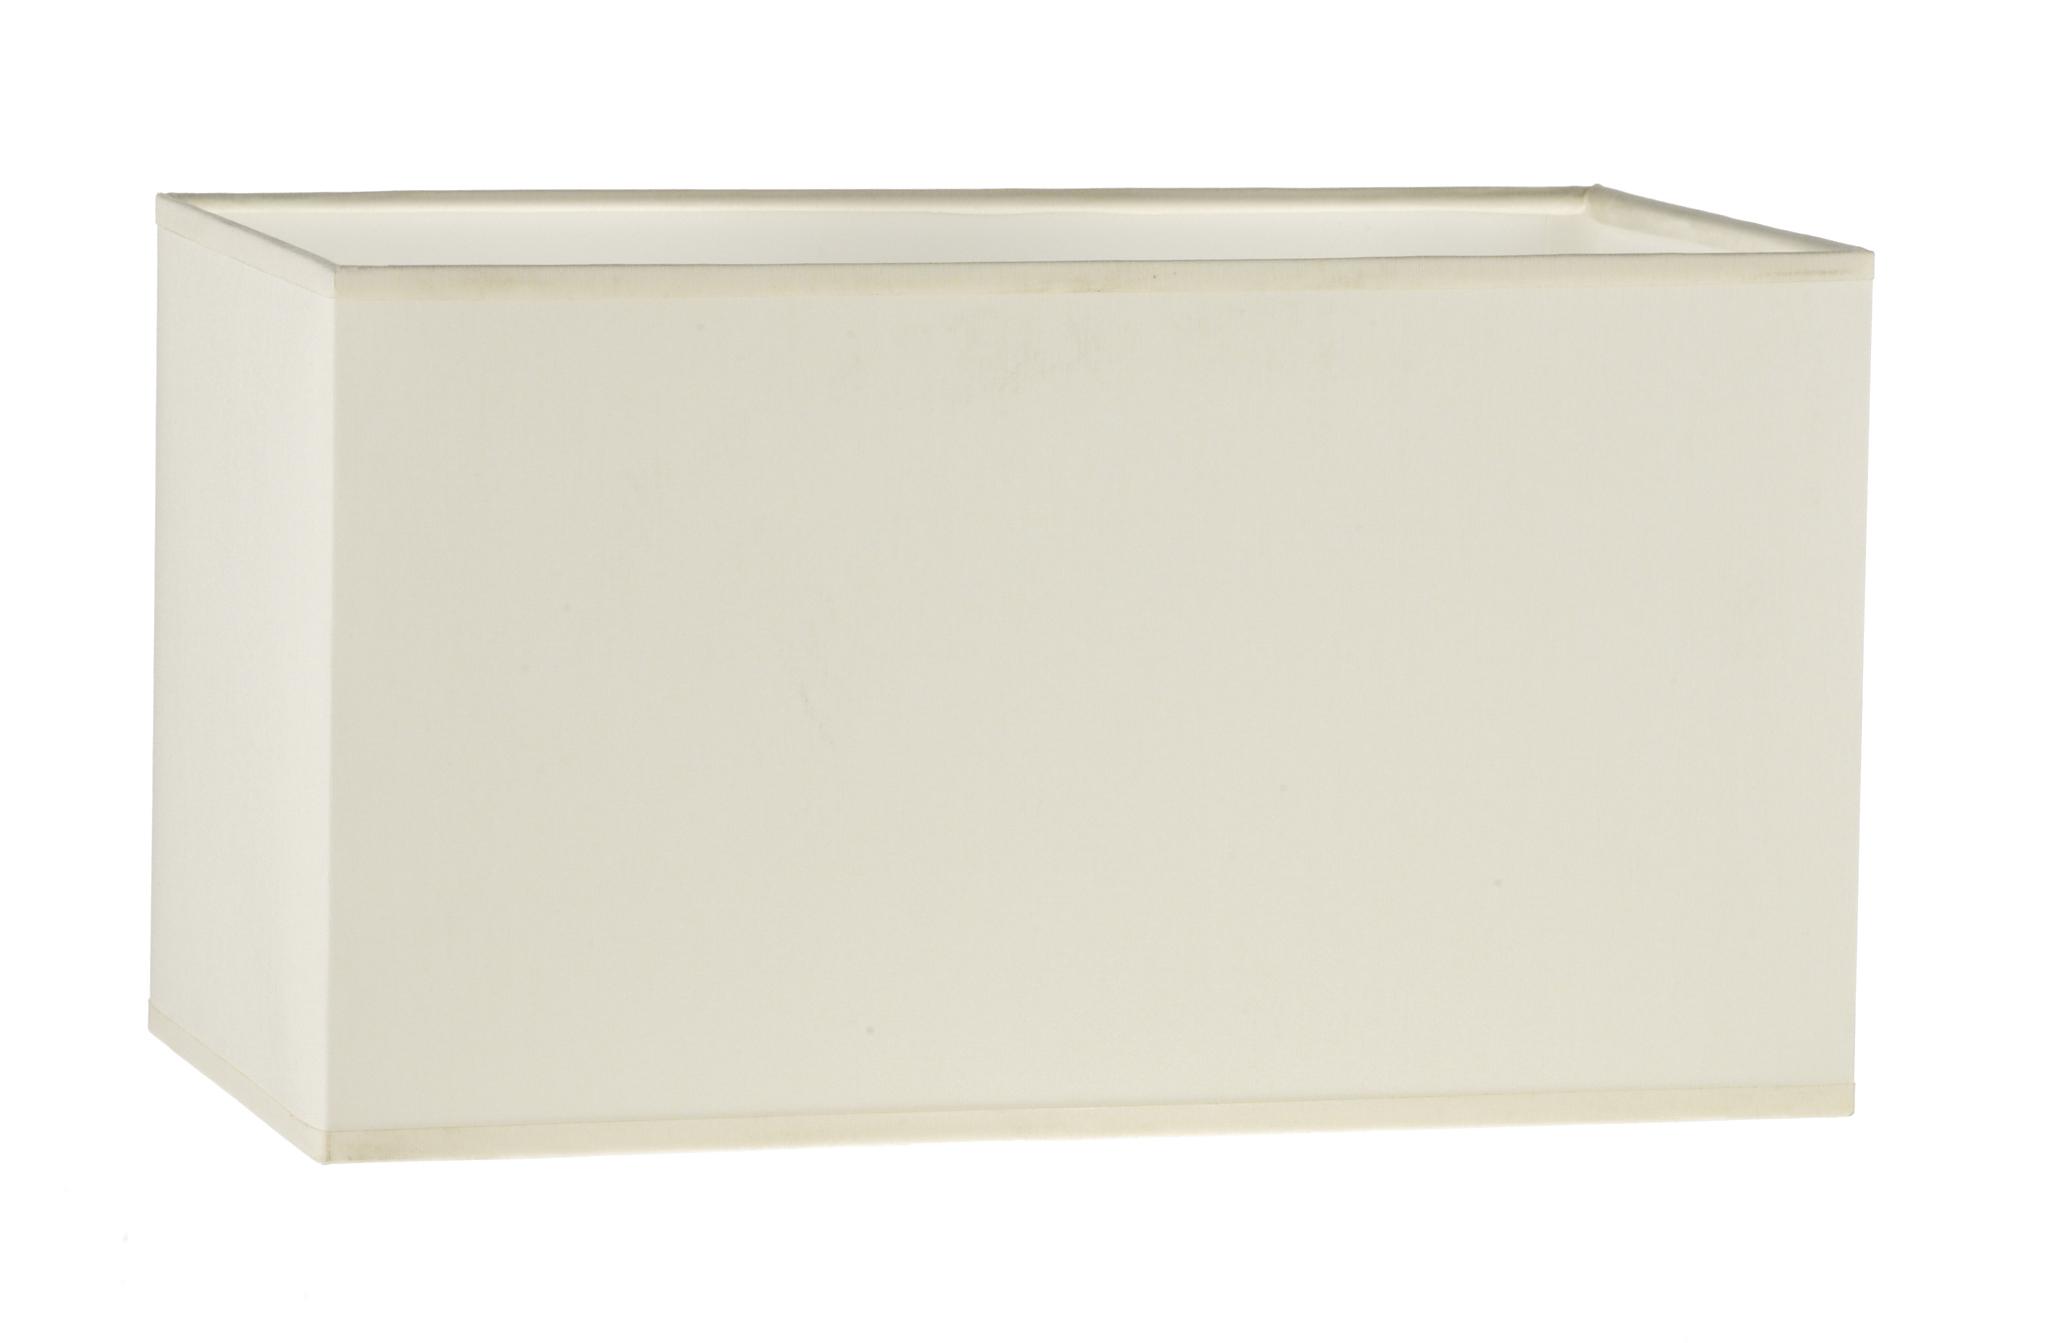 Piza Stylish Rectangular Table Lamp Shade